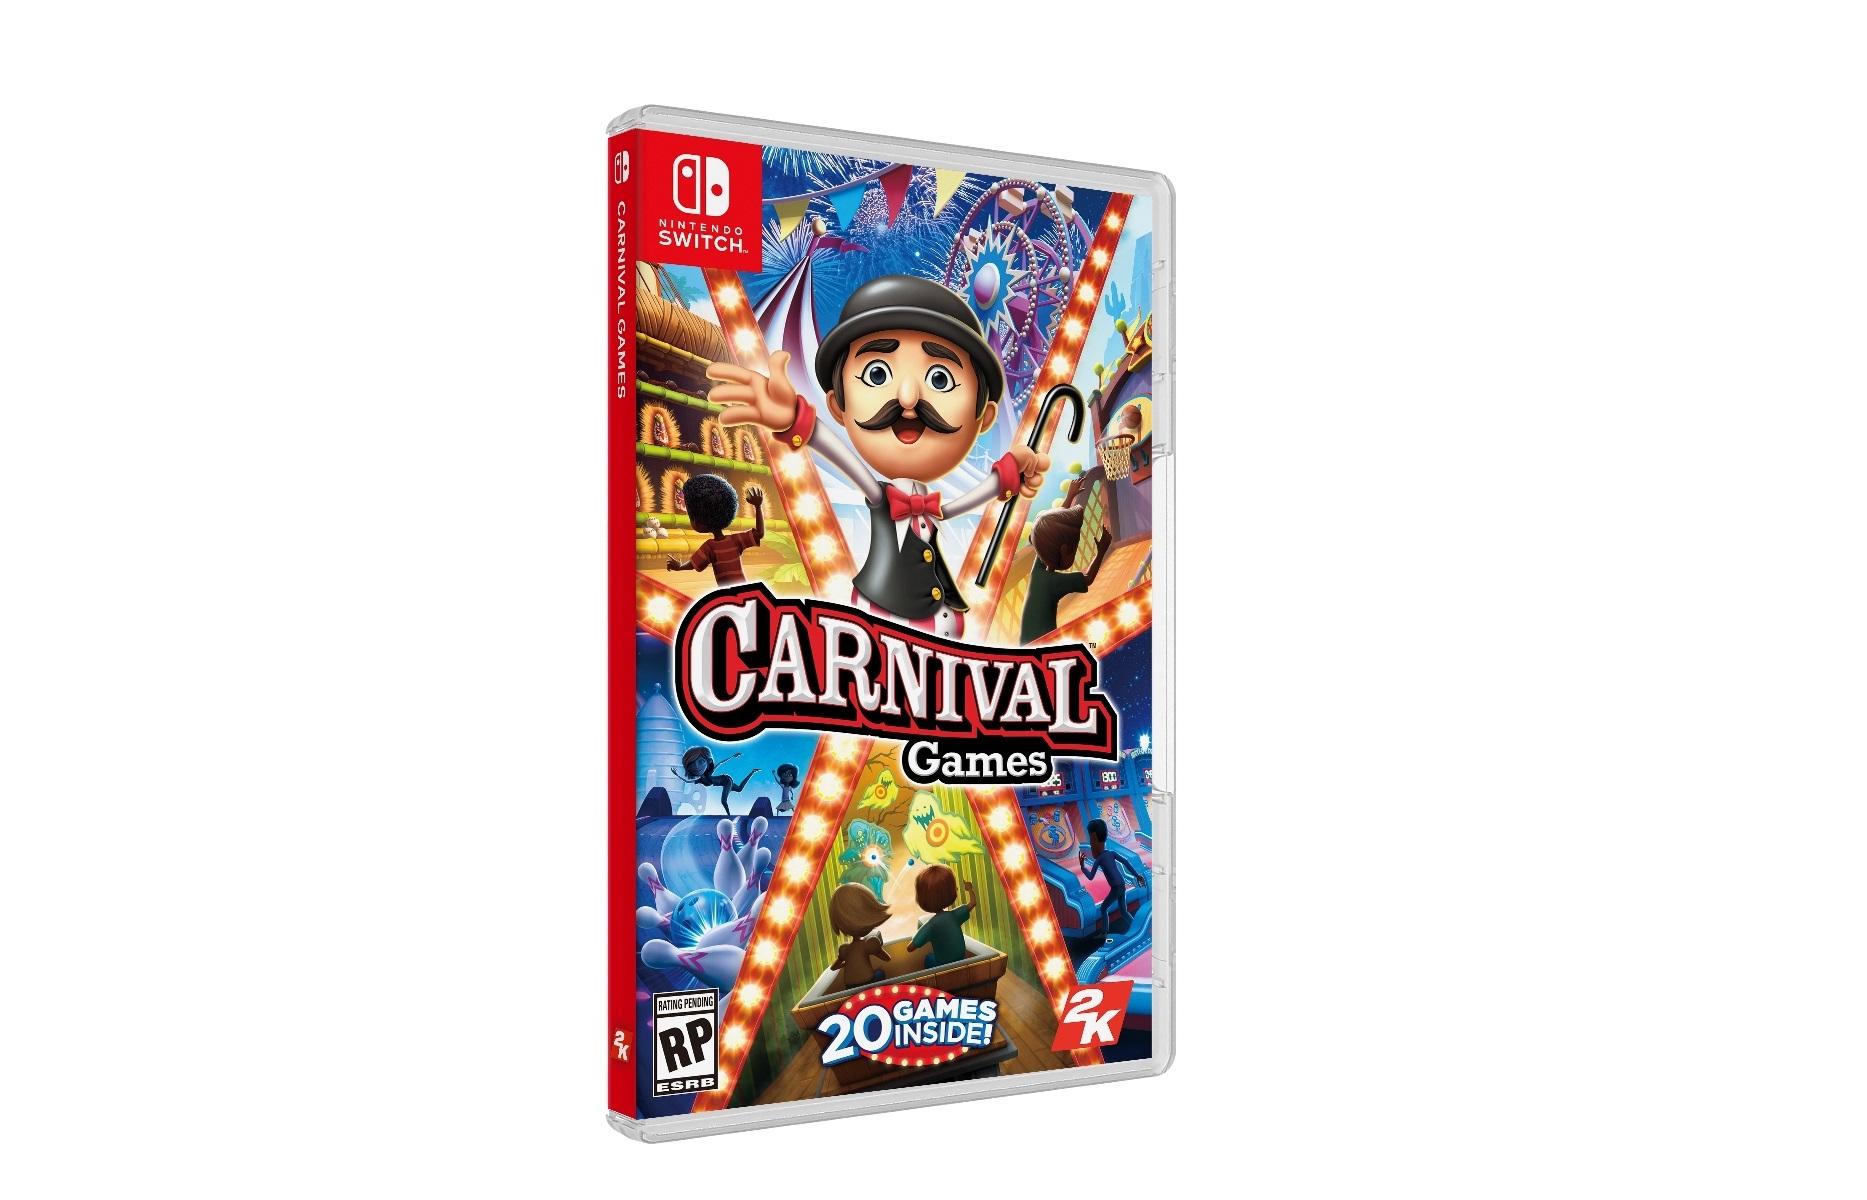 2K bringing back Carnival Games on Switch - Nintendo Everything